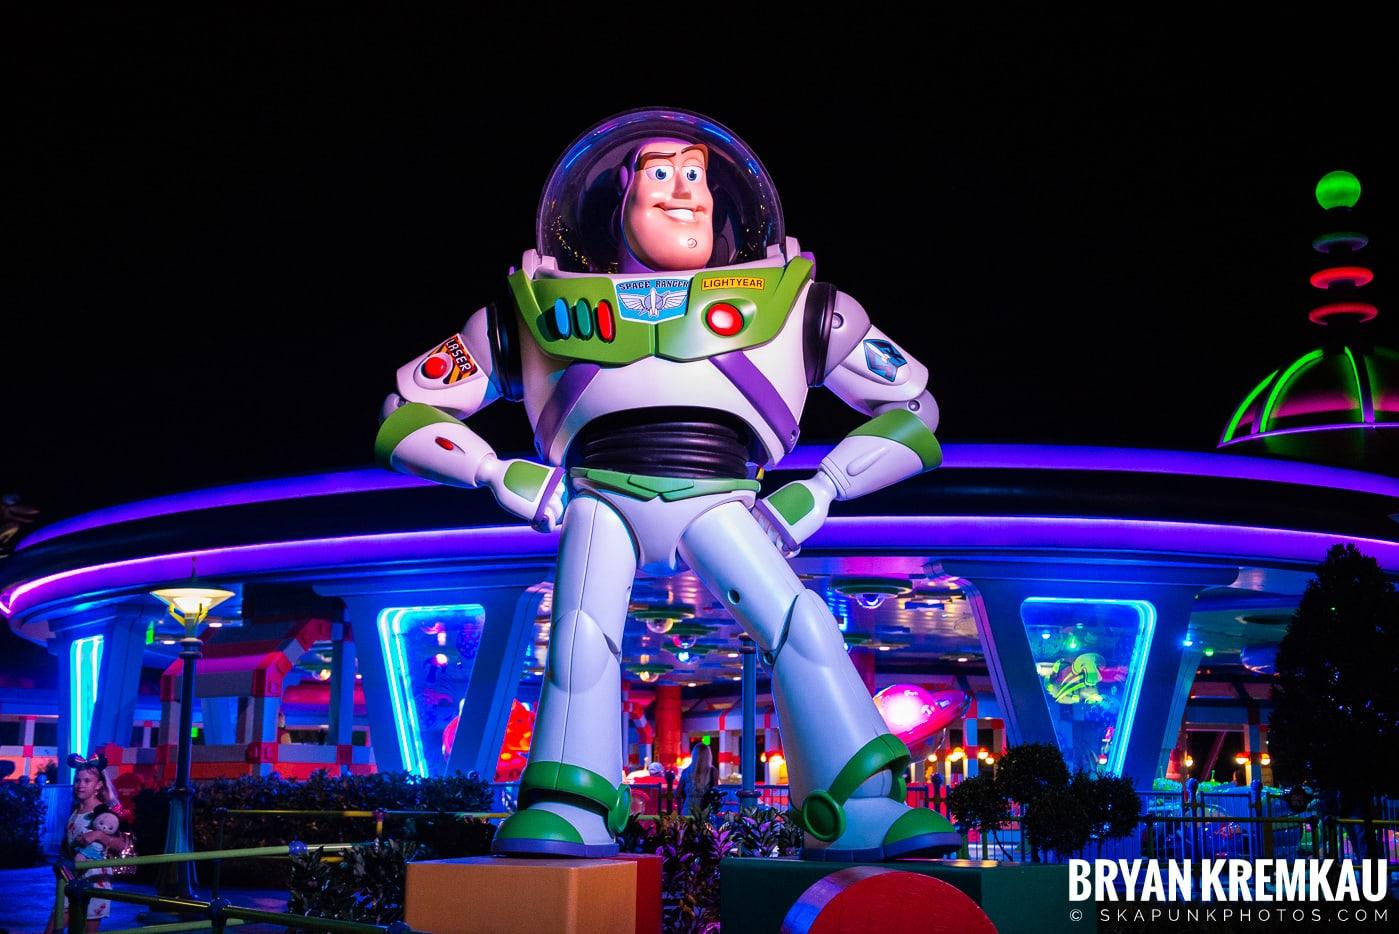 Walt Disney World Vacation: Day 5 (Animal Kingdom / Disney's Hollywood Studios) - 10.3.19 (2)